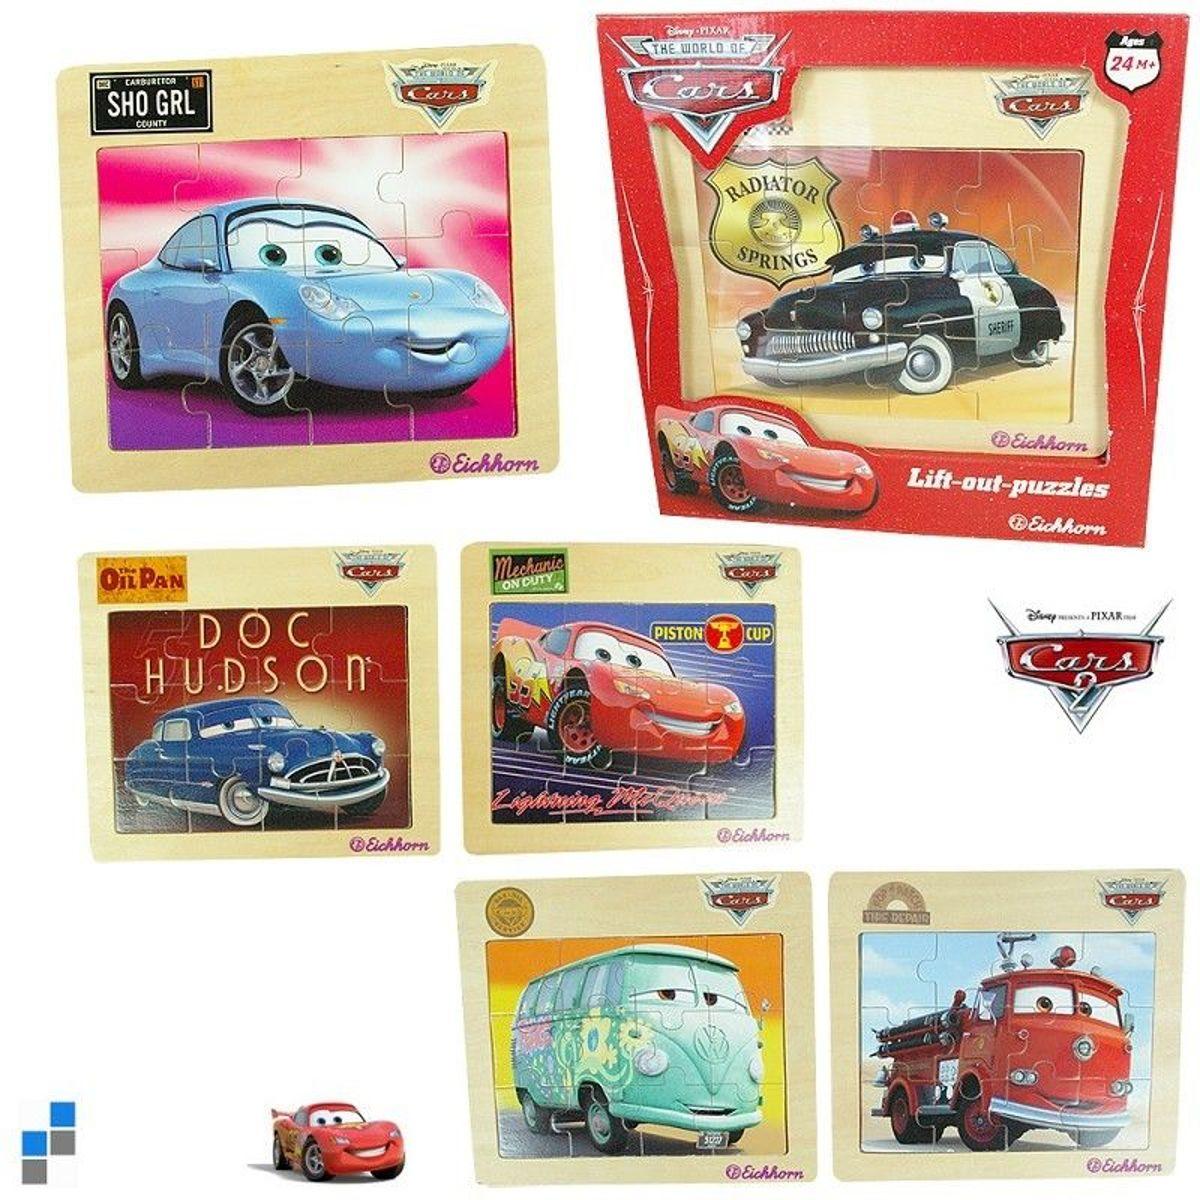 Eichhorn Disney Pixar Cars Lift- out- puzzles Houten puzzel assorti